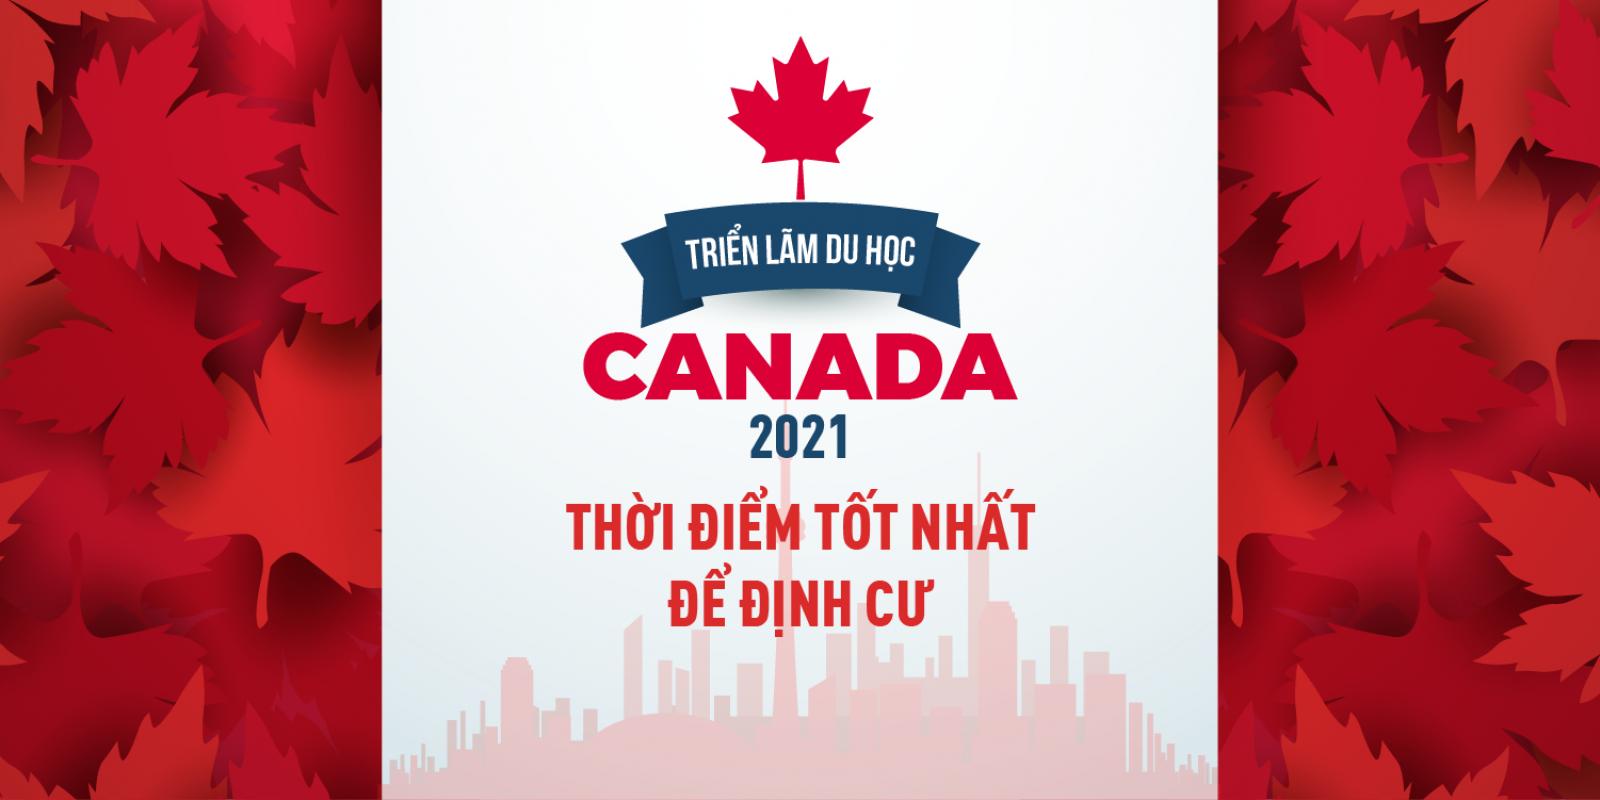 Triển lãm du học Canada 2021